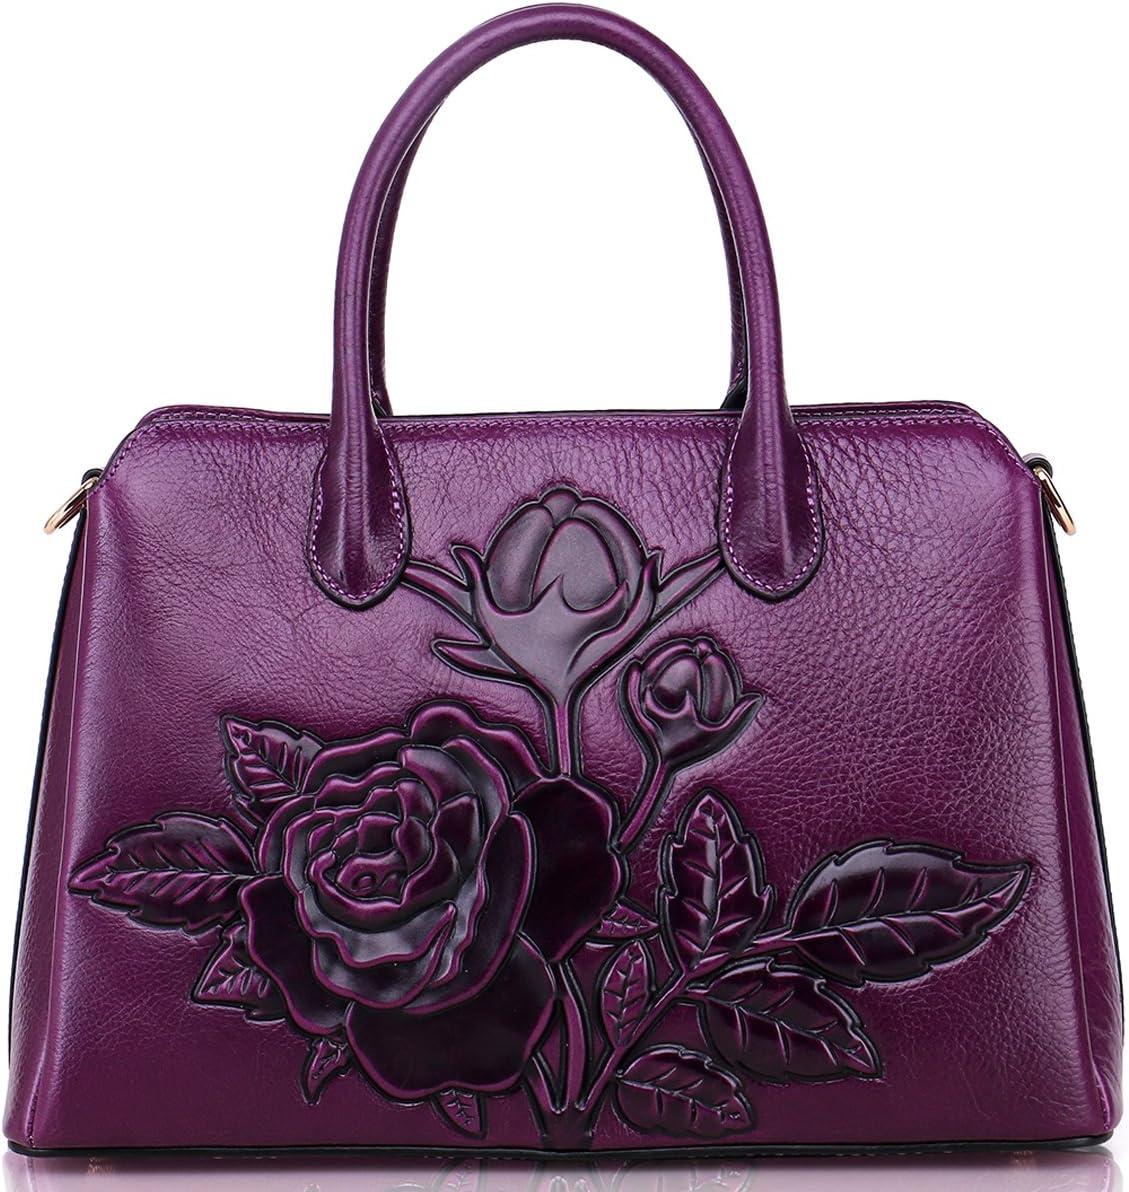 Genuine Leather Handbags for Women Designer, Ladies Vintage Classic Cowhide Leather Tote Satchel Crossbody Shoulder Bags Messenger Bag Female Bag Purple